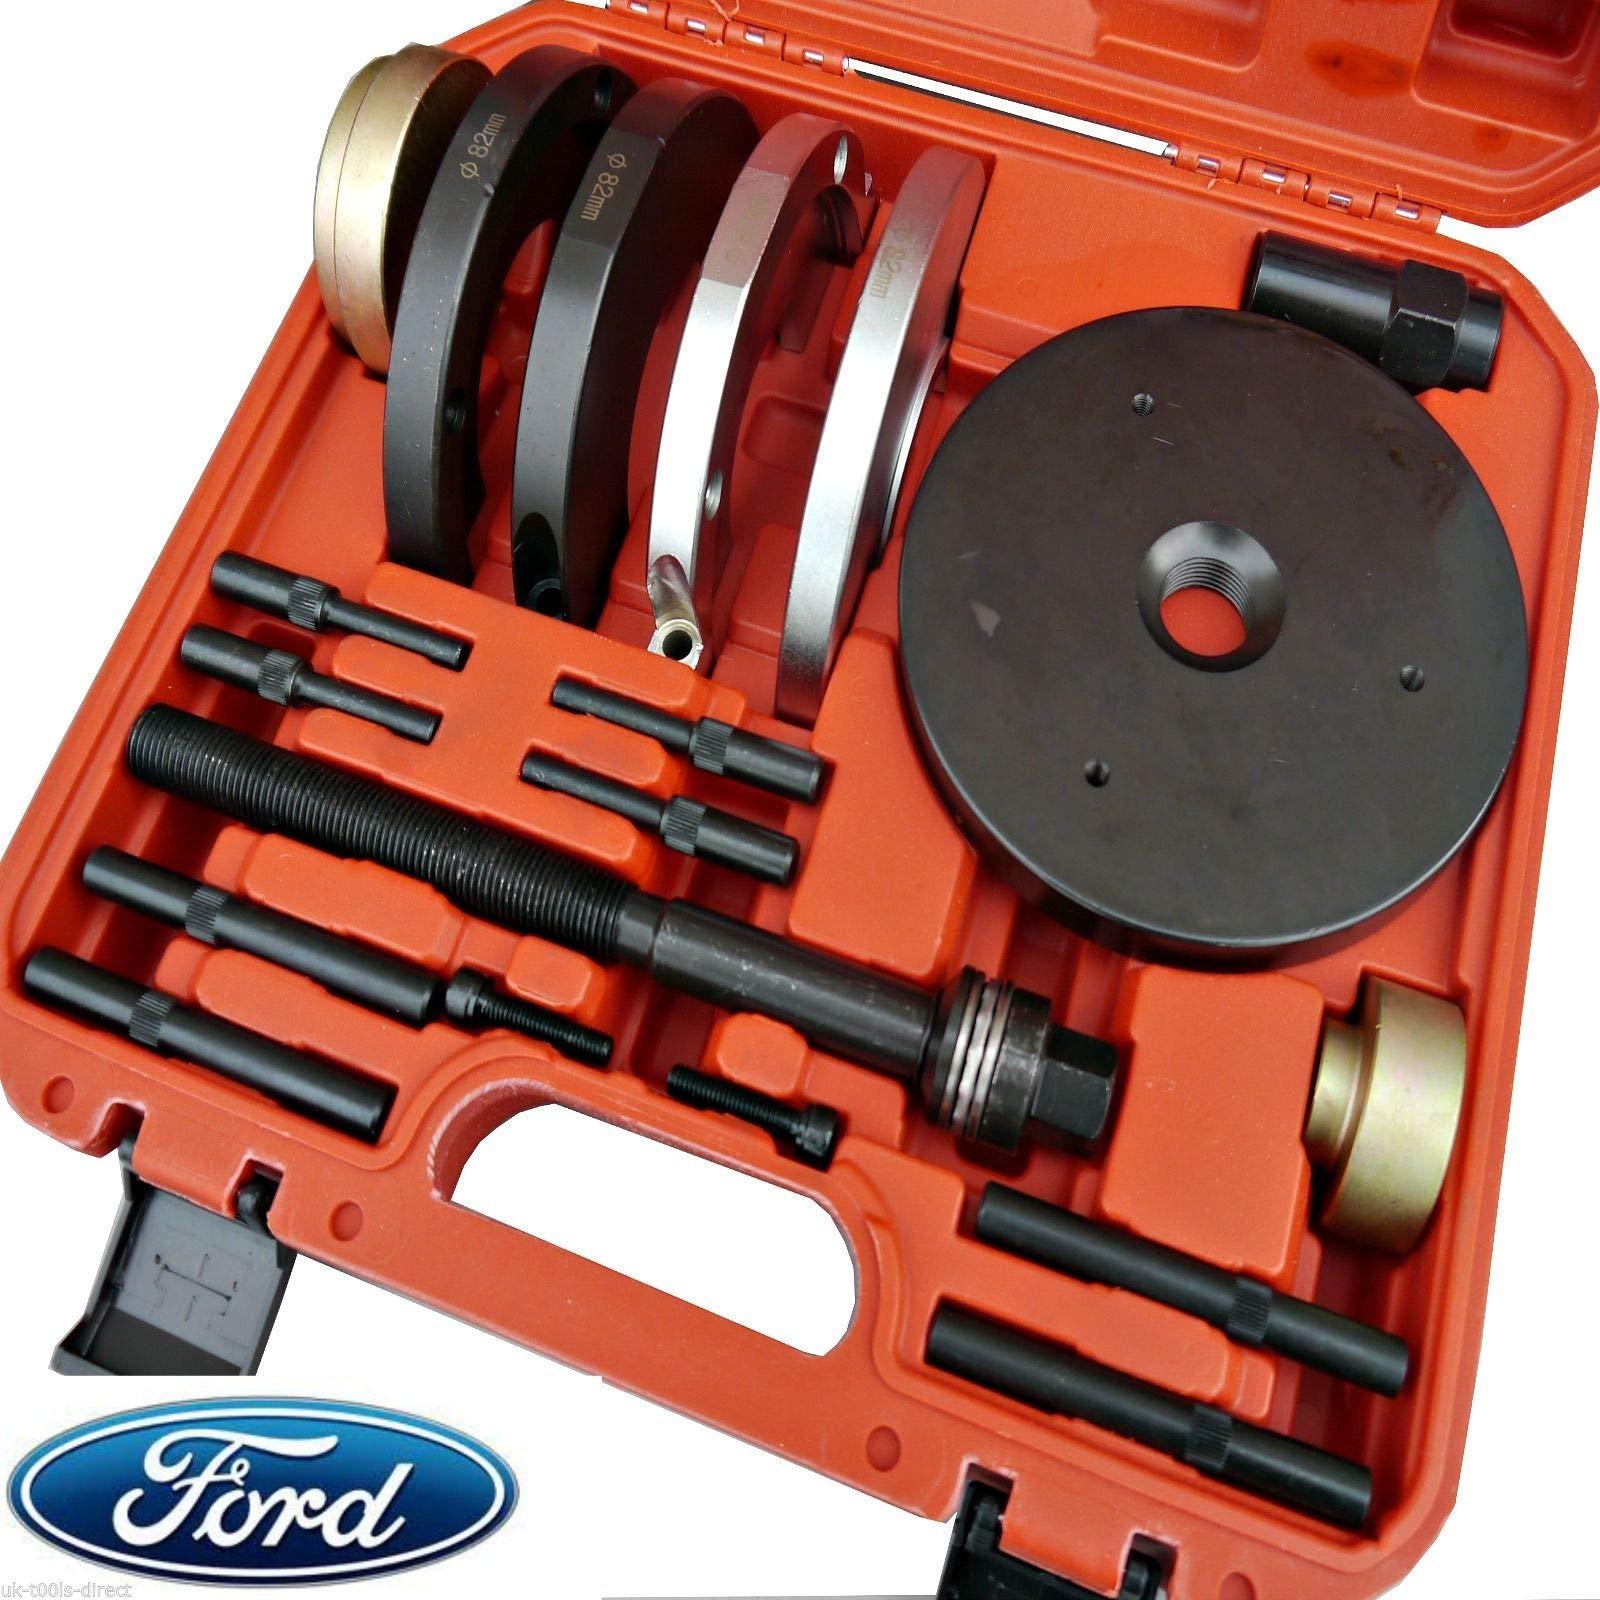 Ford Transit Wheel Hub Puller Professional